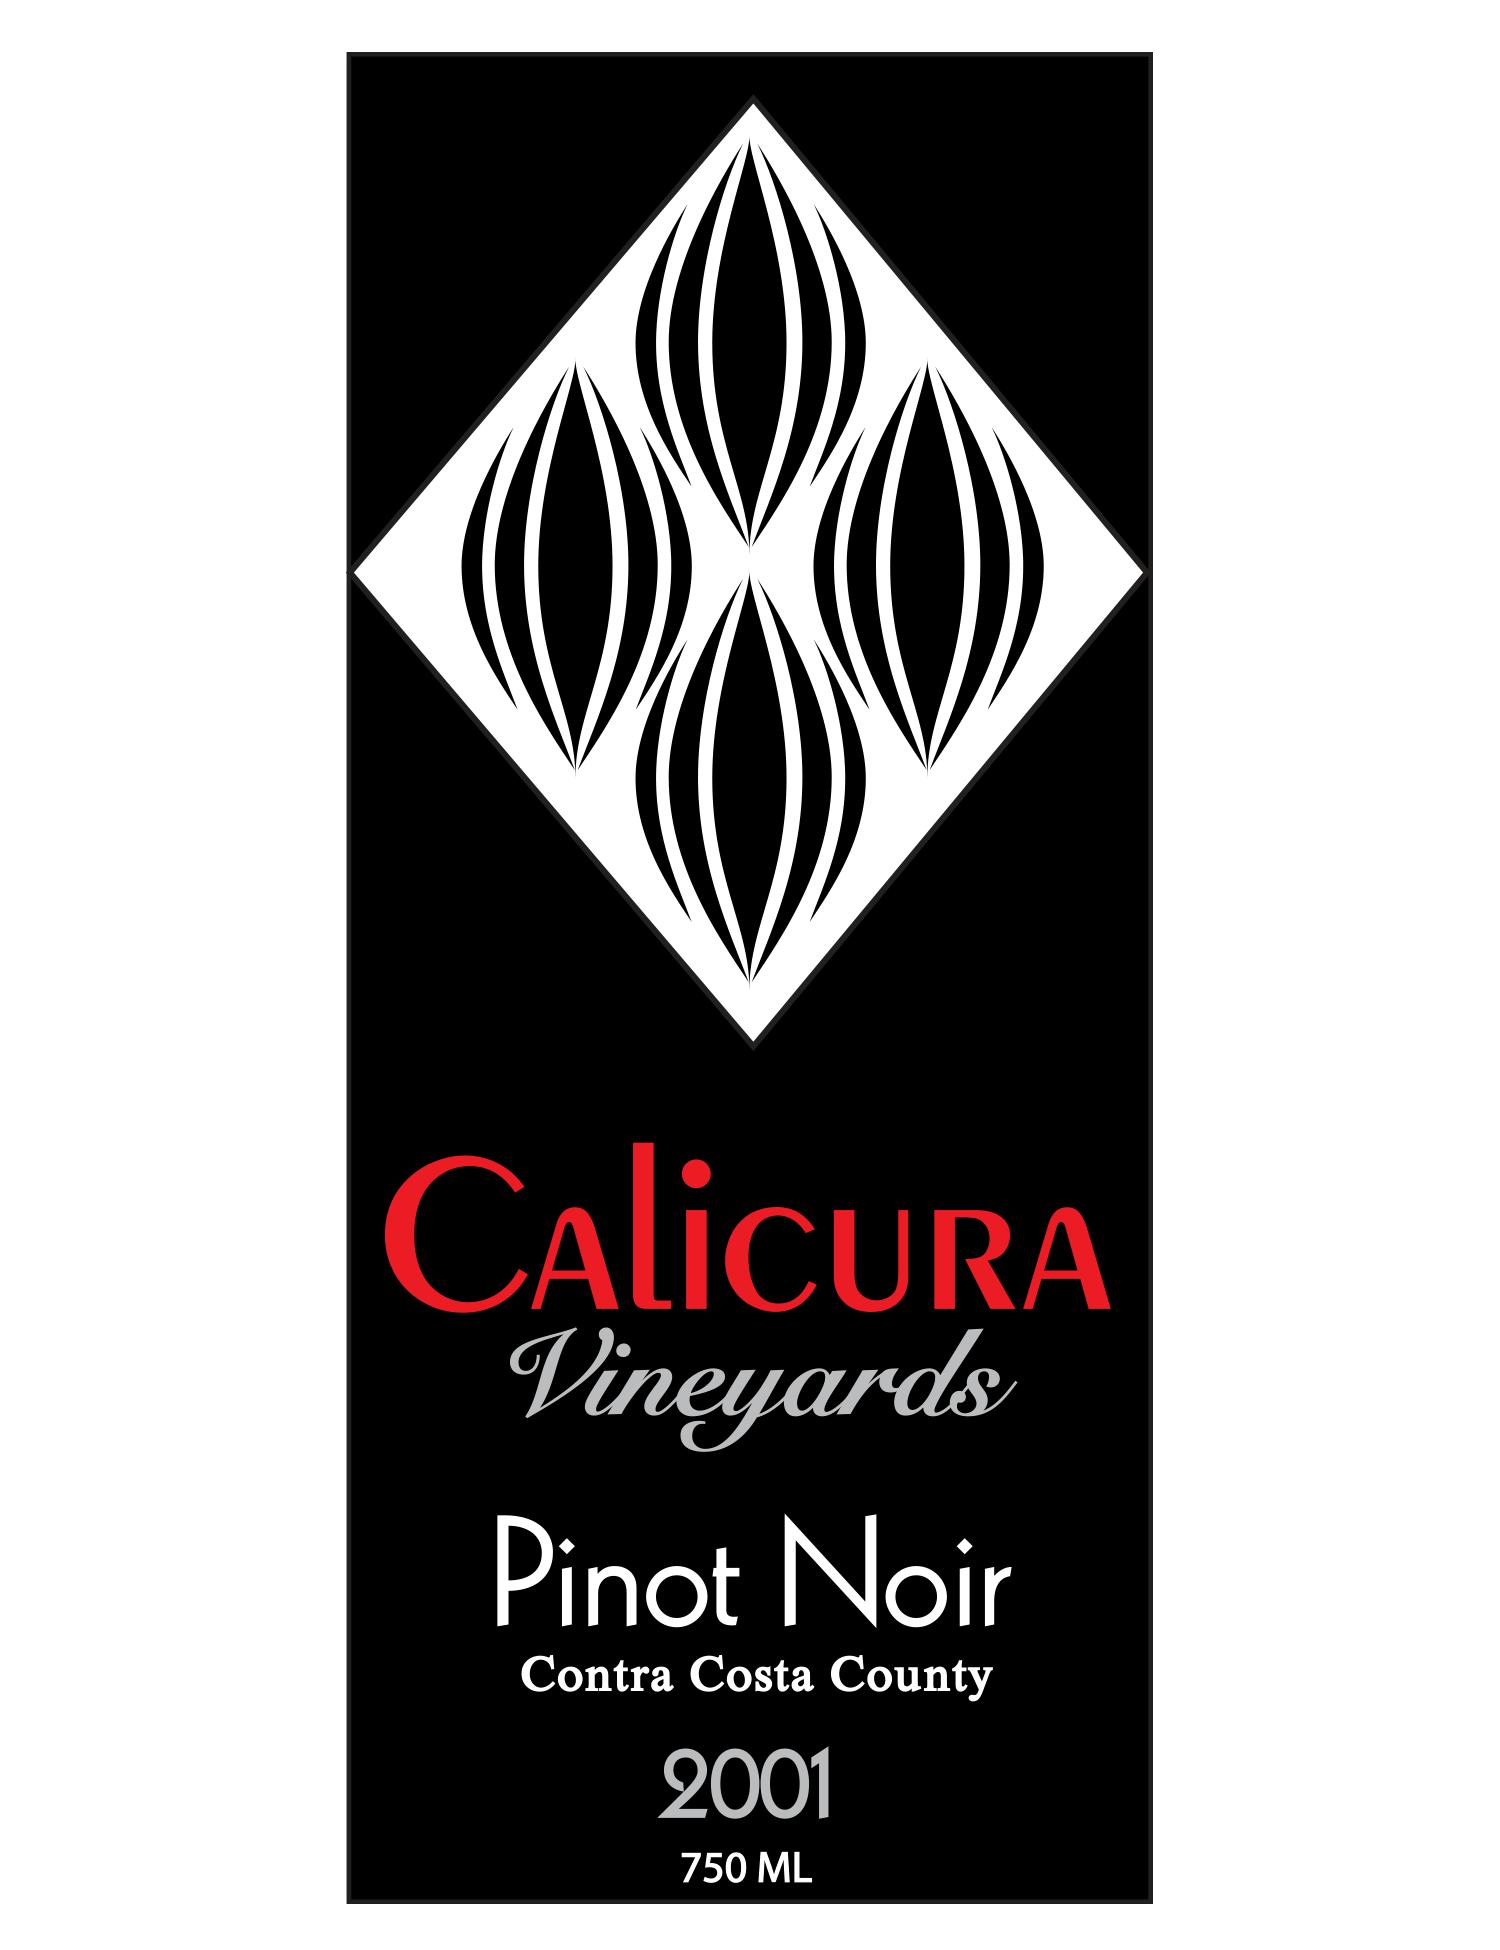 calicura_wine_label_andi_bird.png